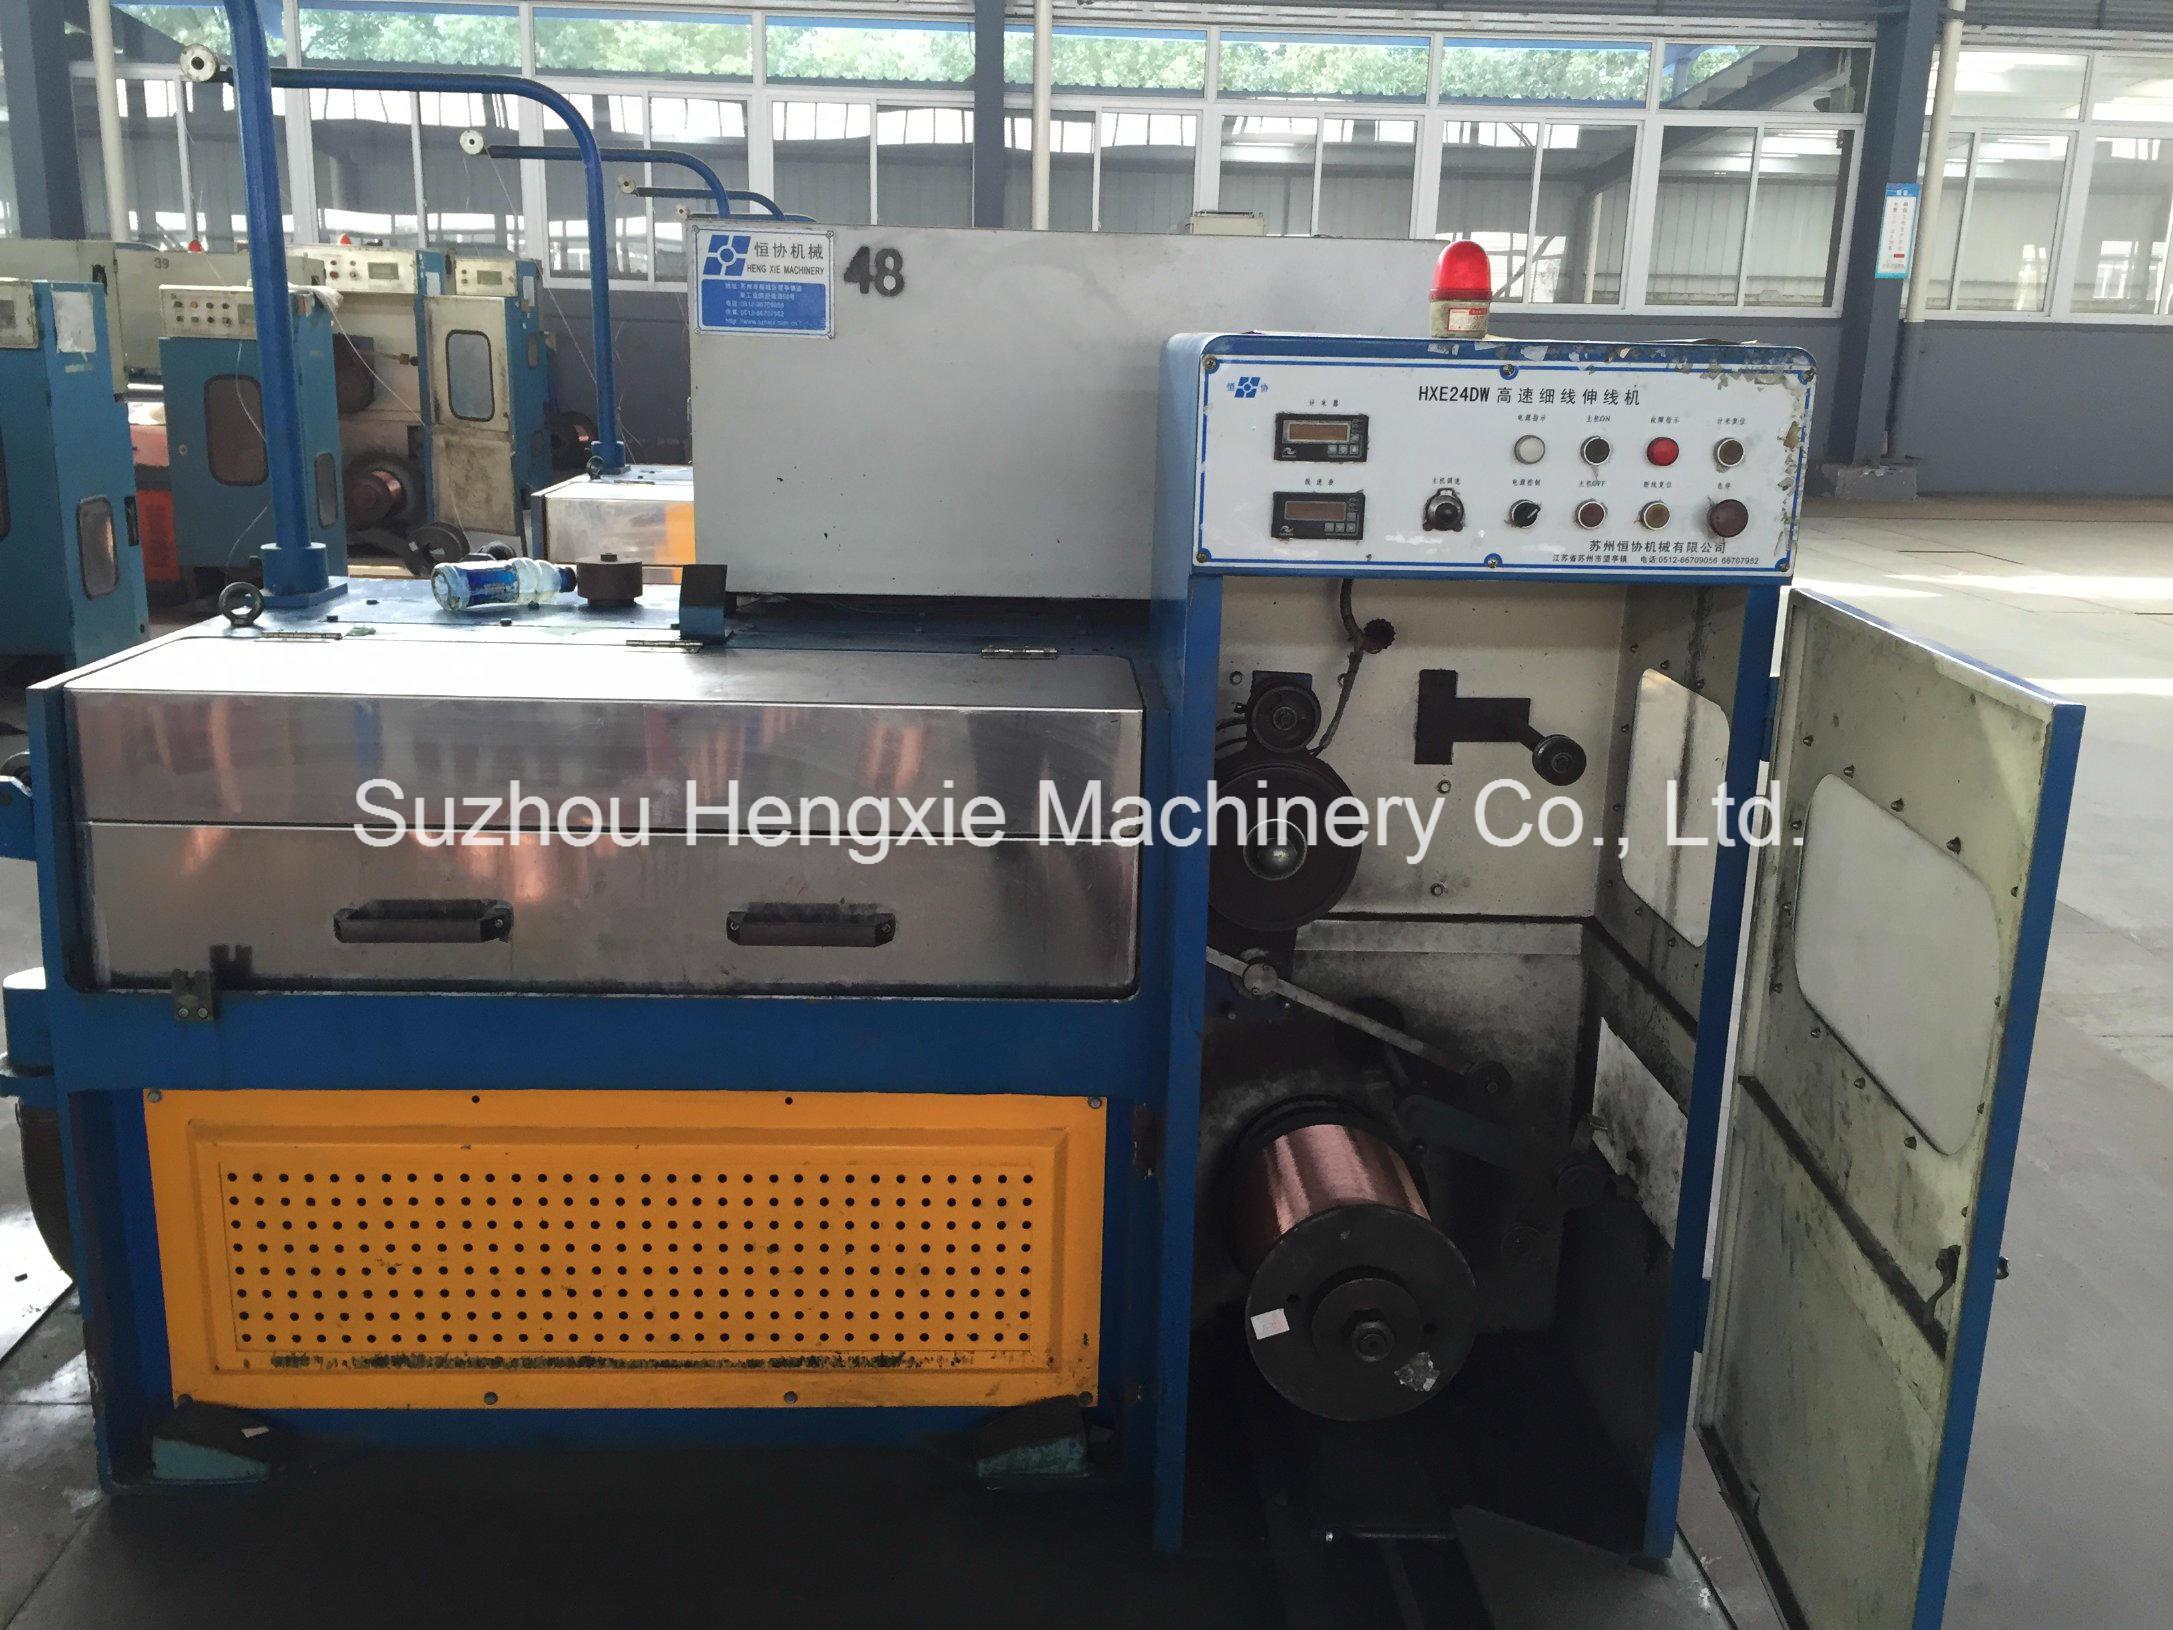 Hxe-22dw Horizontal Fine Copper Wire Pulling Machine; Chinese ...